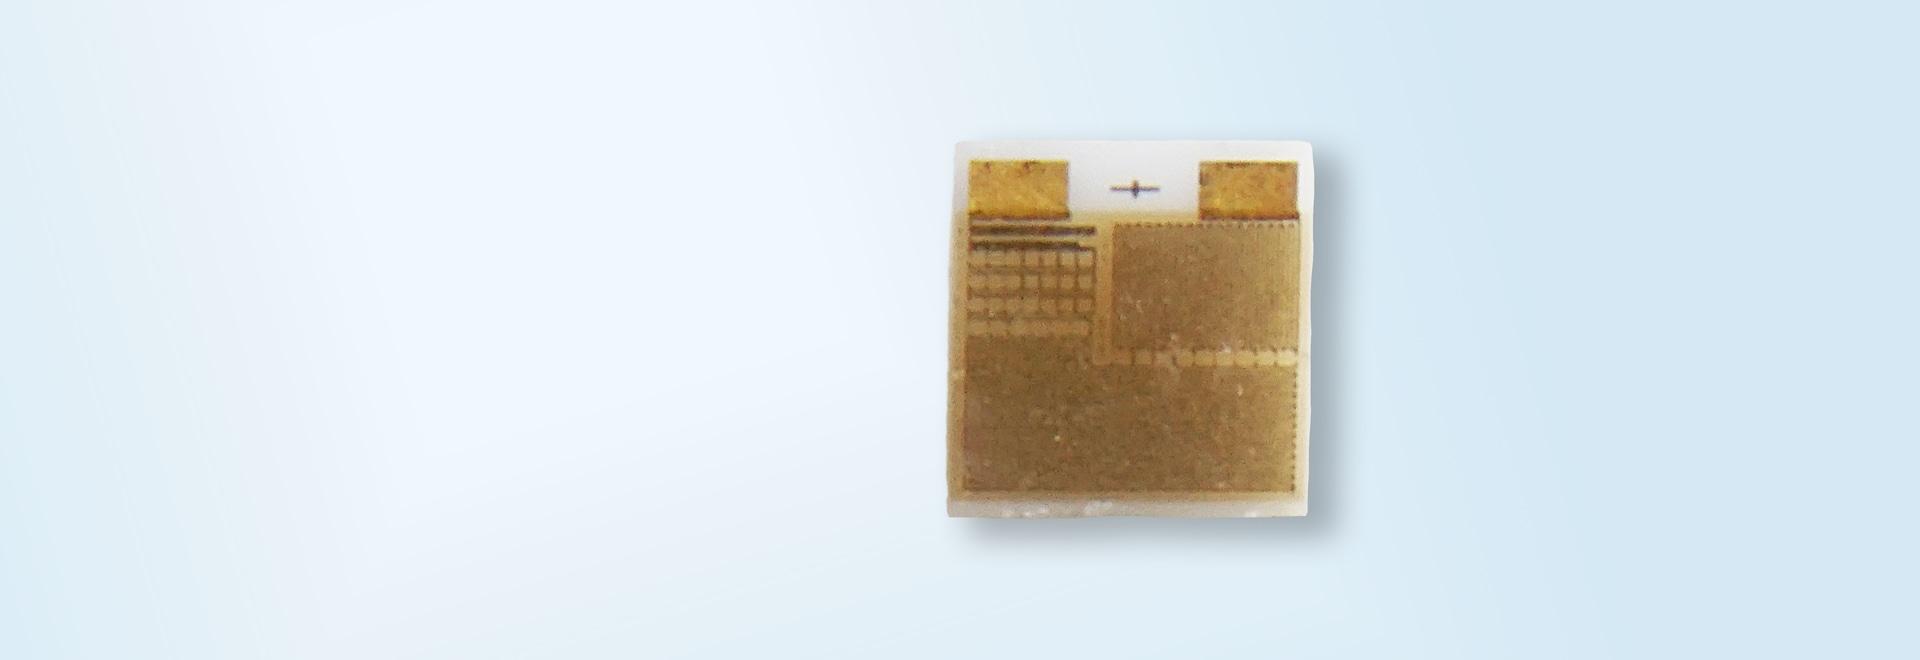 The smallest platinum RTD - BondSens